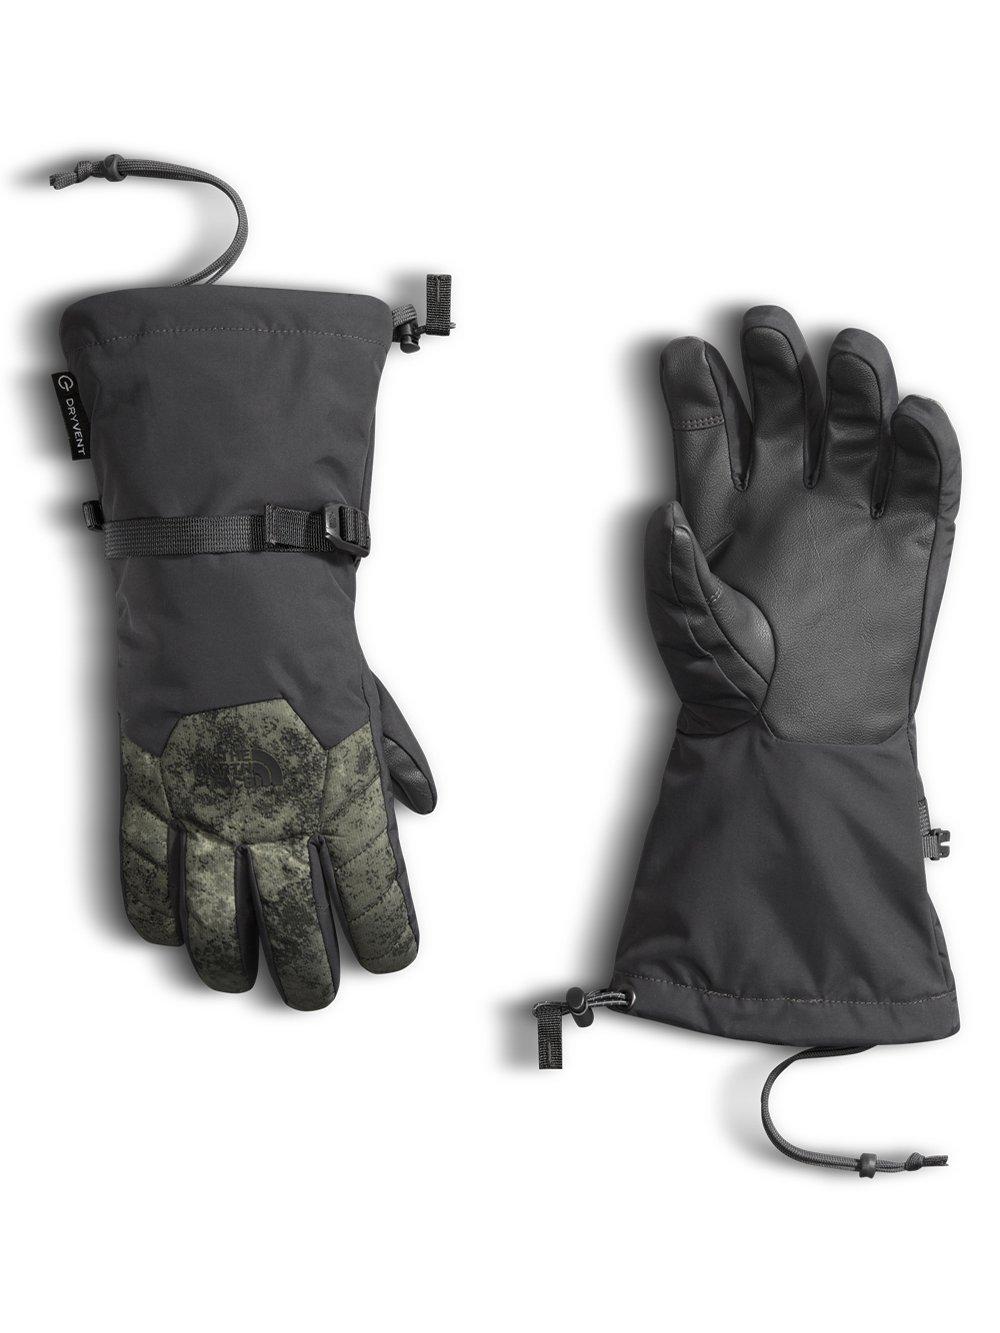 The North Face Boys' Revelstoke Etip Glove - Asphalt Grey/peat Grey Stonewash